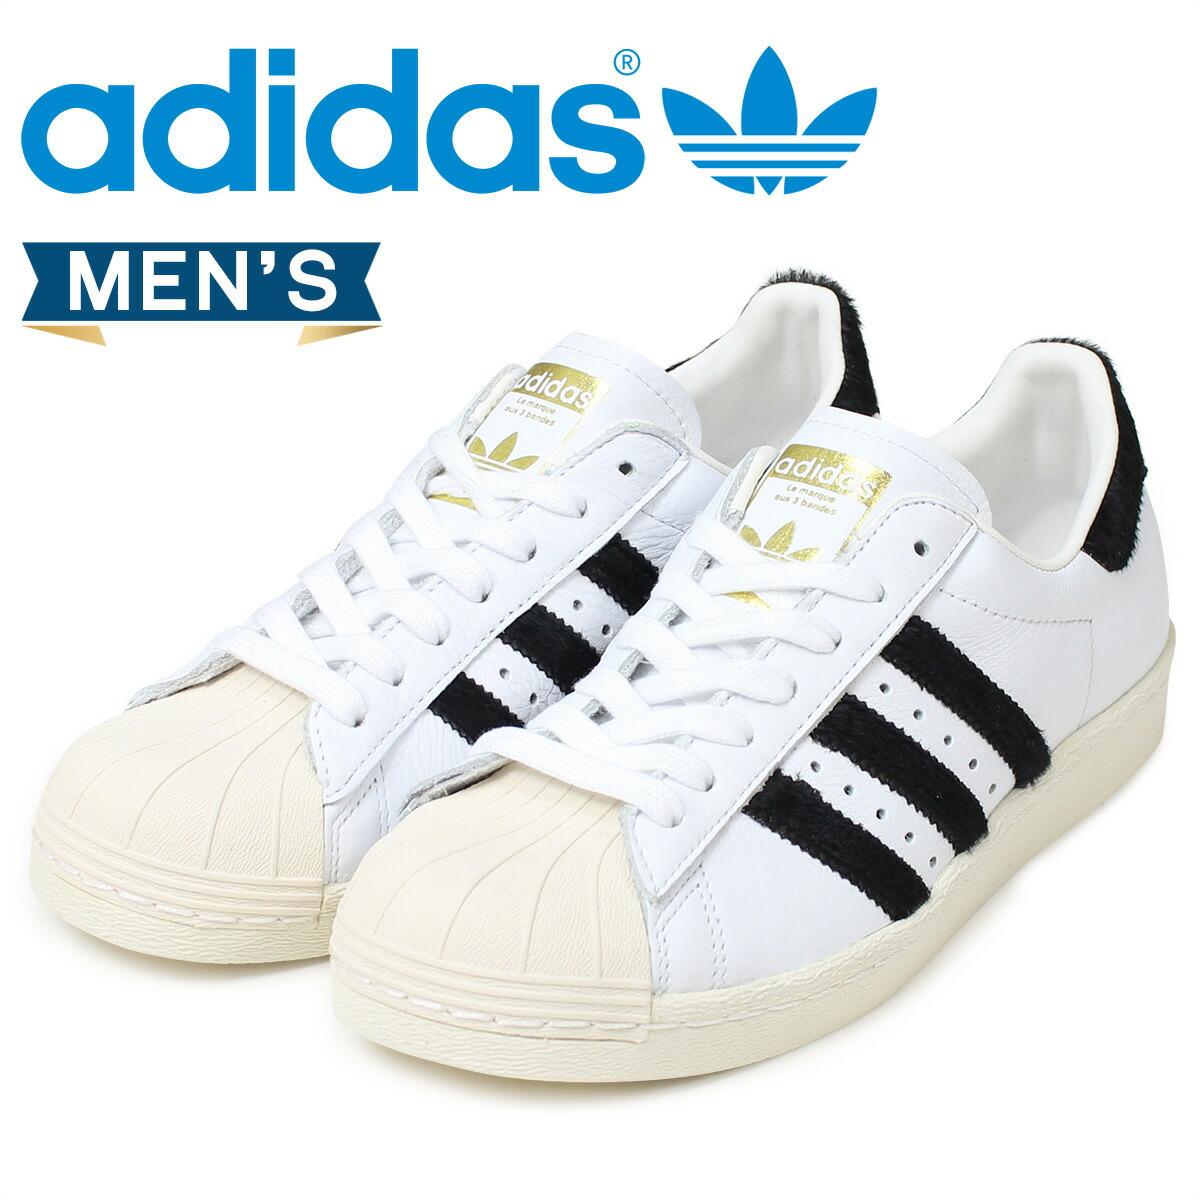 adidas superstar for men